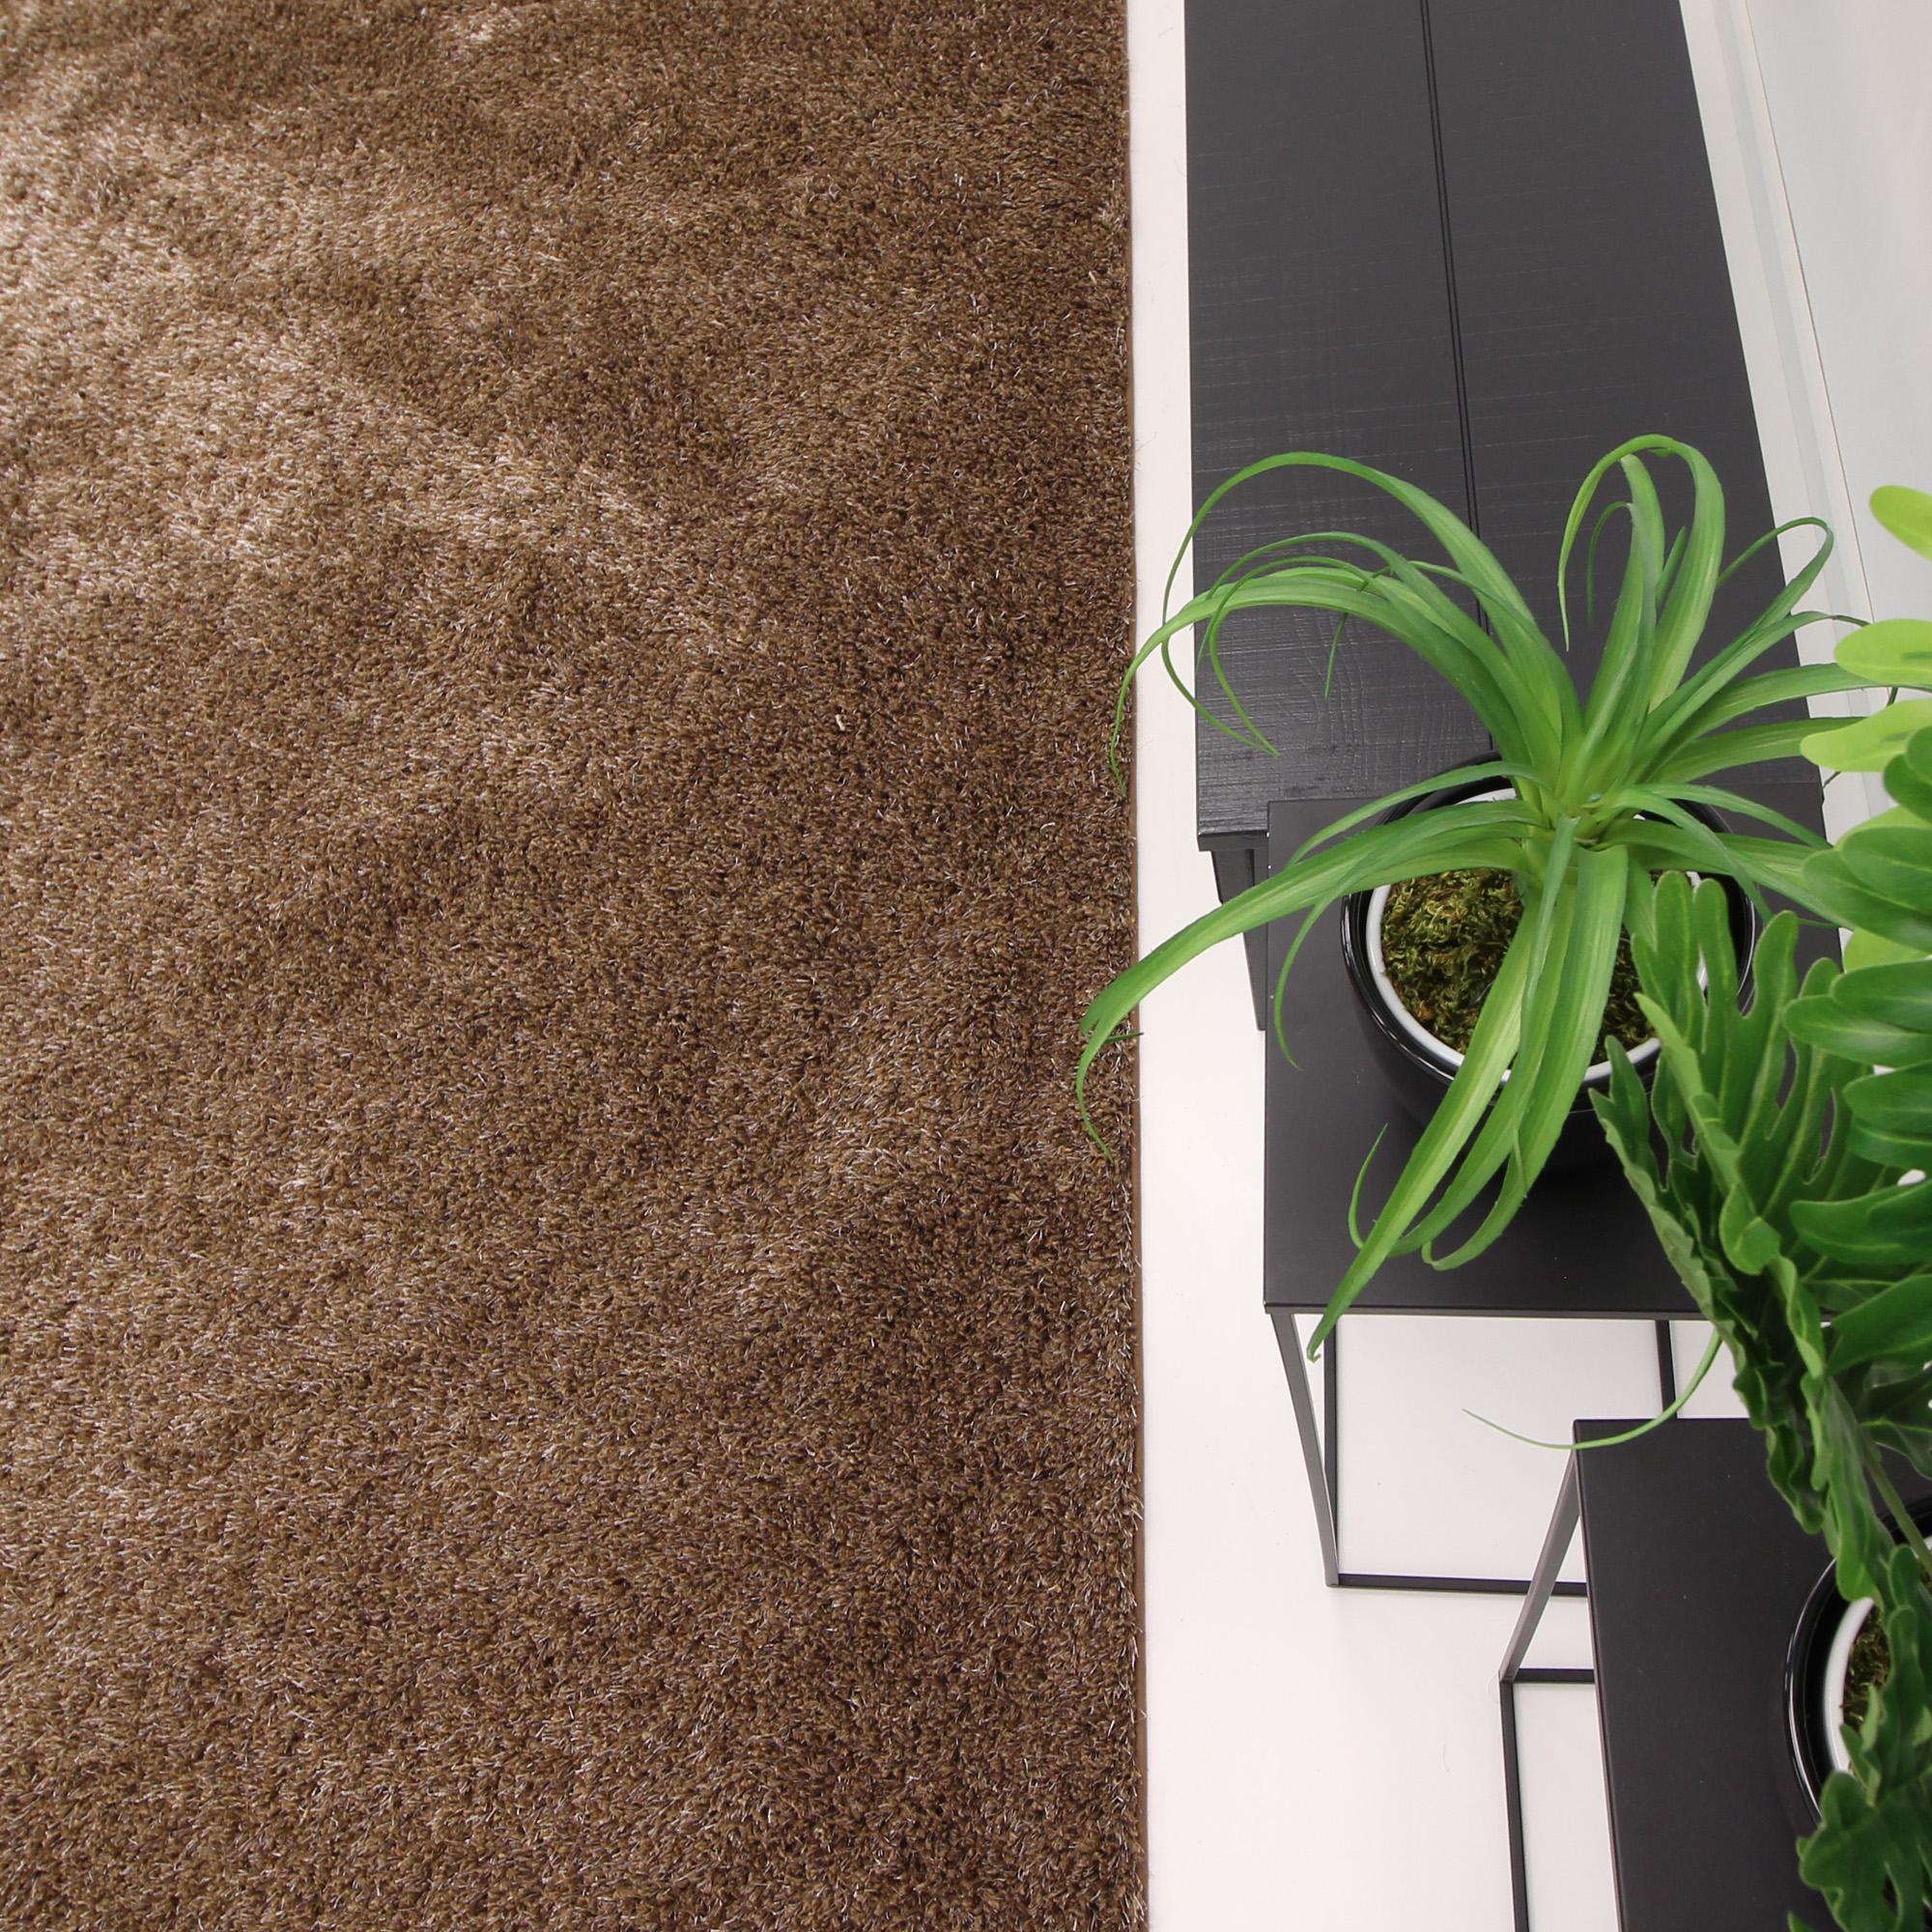 Vloerkleed Xilento Spider Browny | 170 x 230 cm